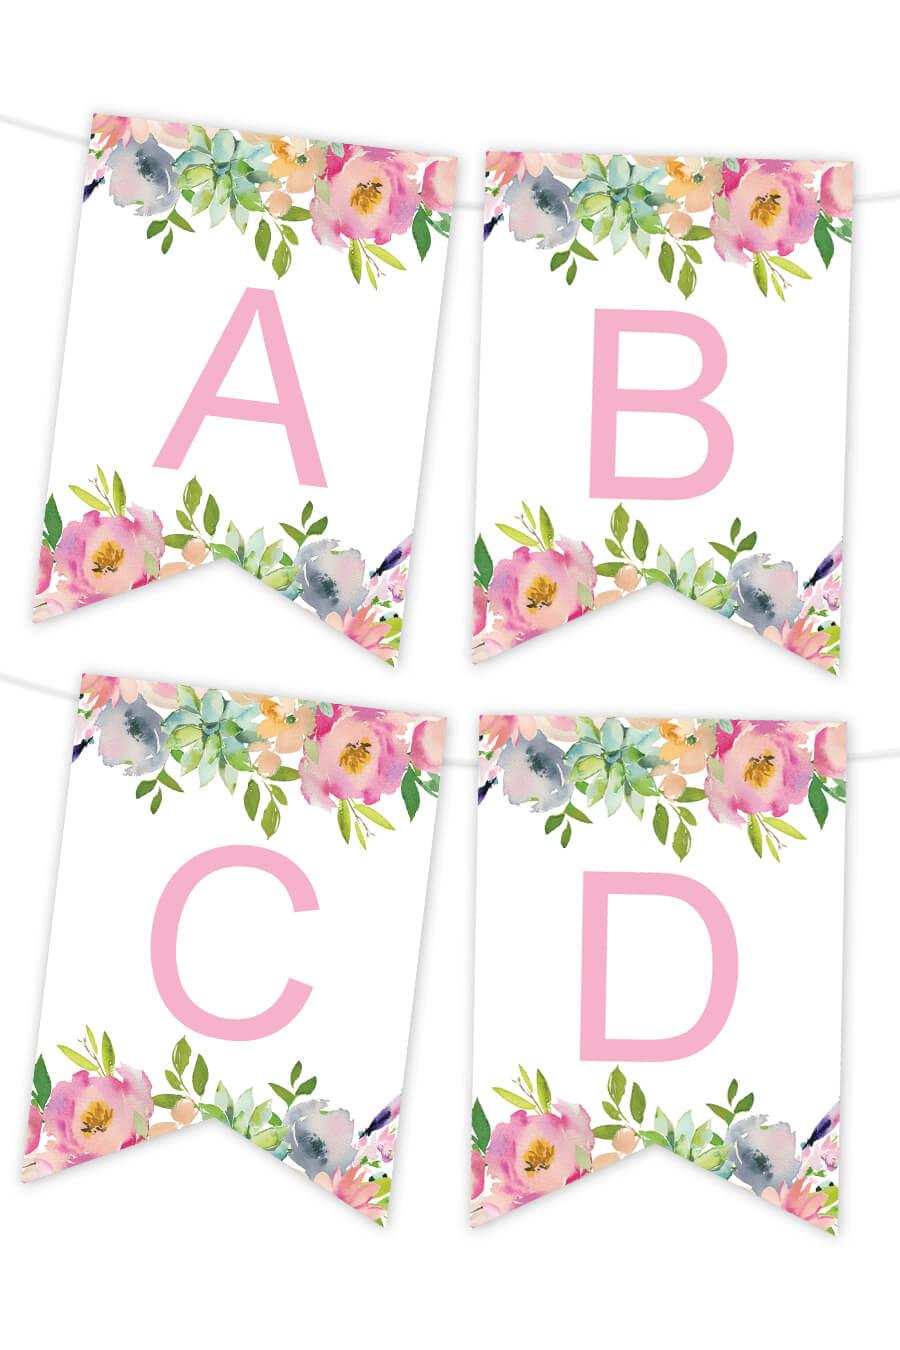 Impertinent Free Printable Banner Templates   Kenzi's Blog Inside Free Bridal Shower Banner Template